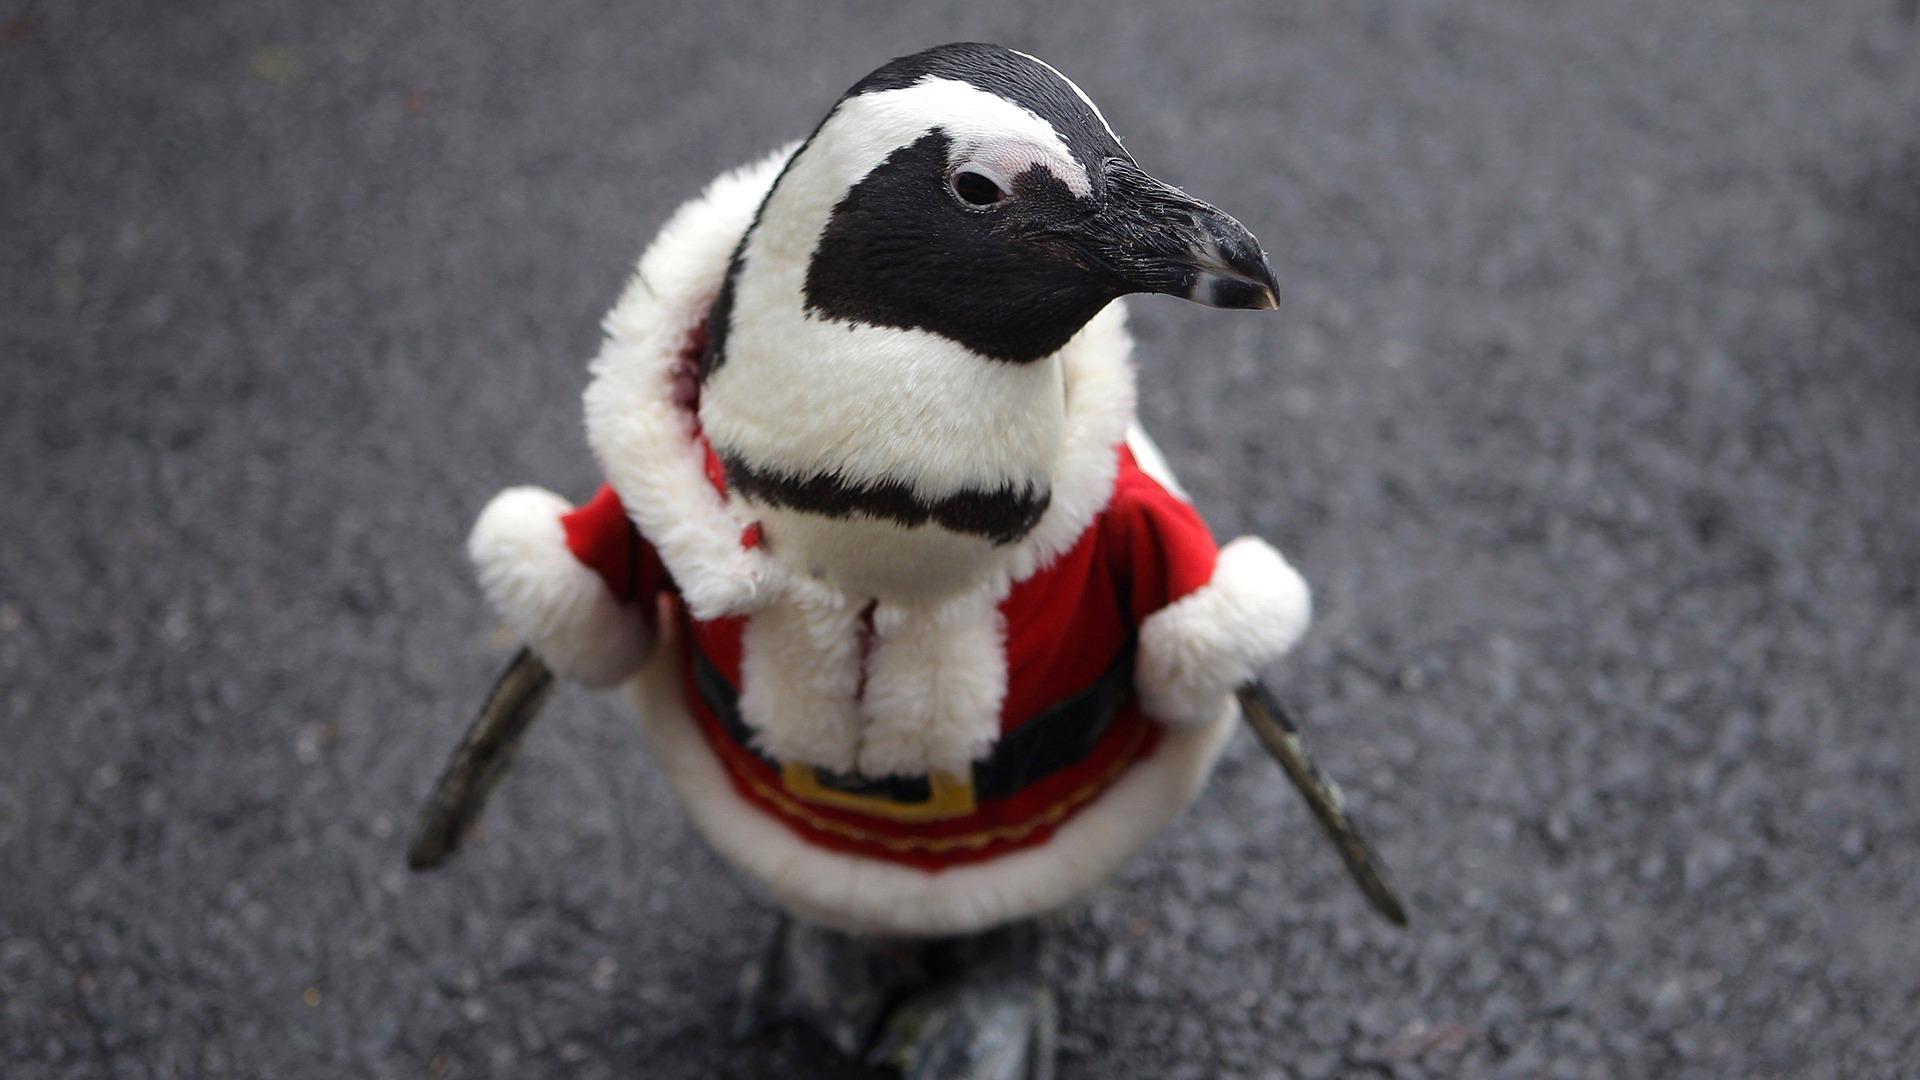 Image: Penguins Dress As Santa Claus At Everland